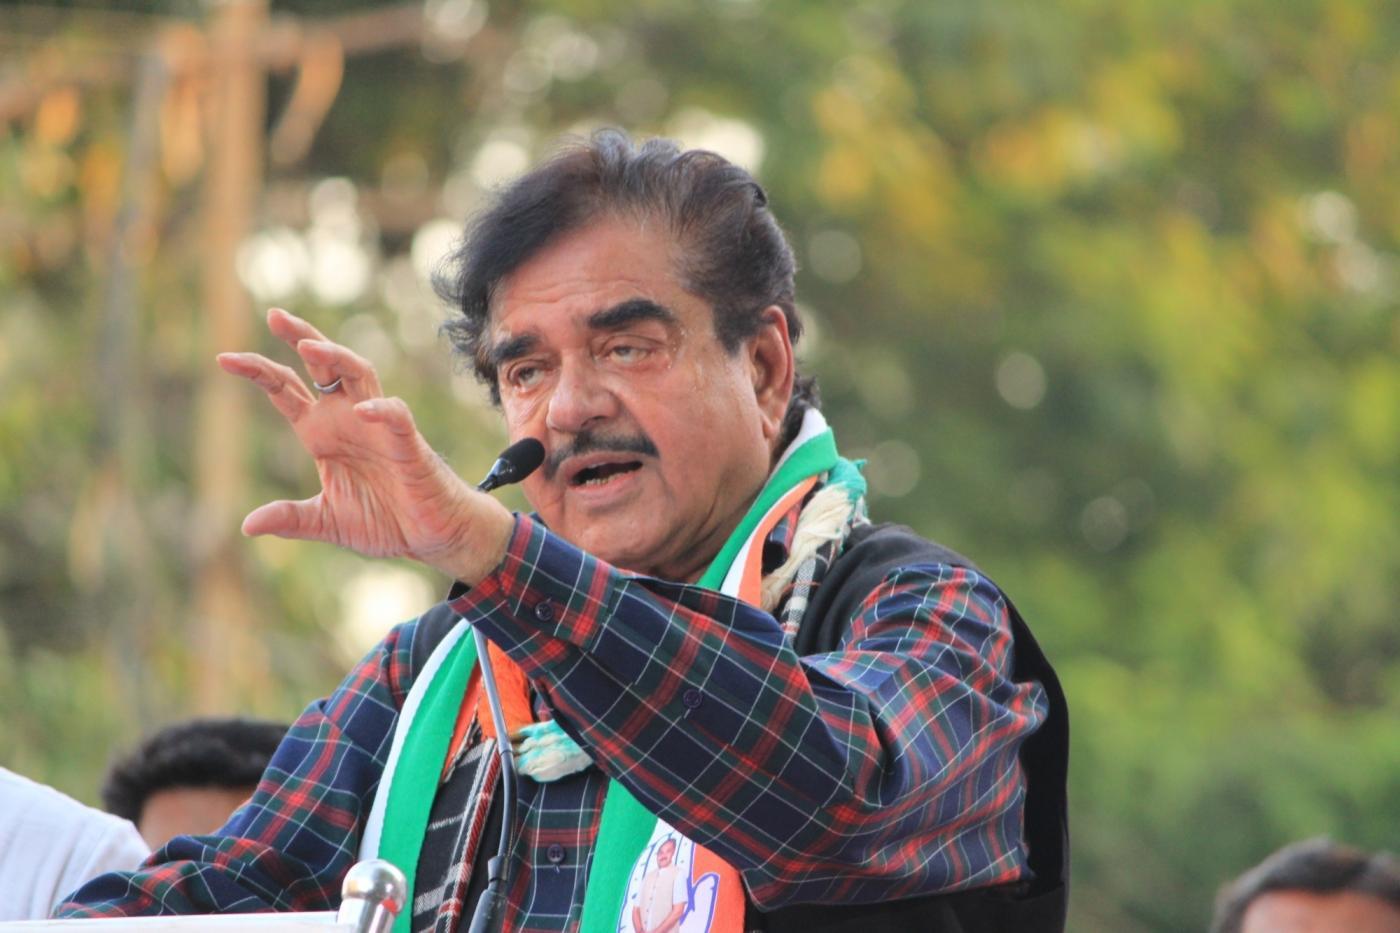 Vadodara: Congress leader Shatrughan Sinha addresses during an election campaign rally ahead of the 2019 Lok Sabha elections in Vadodara, Gujurat on April 20, 2019. (Photo: IANS) by .